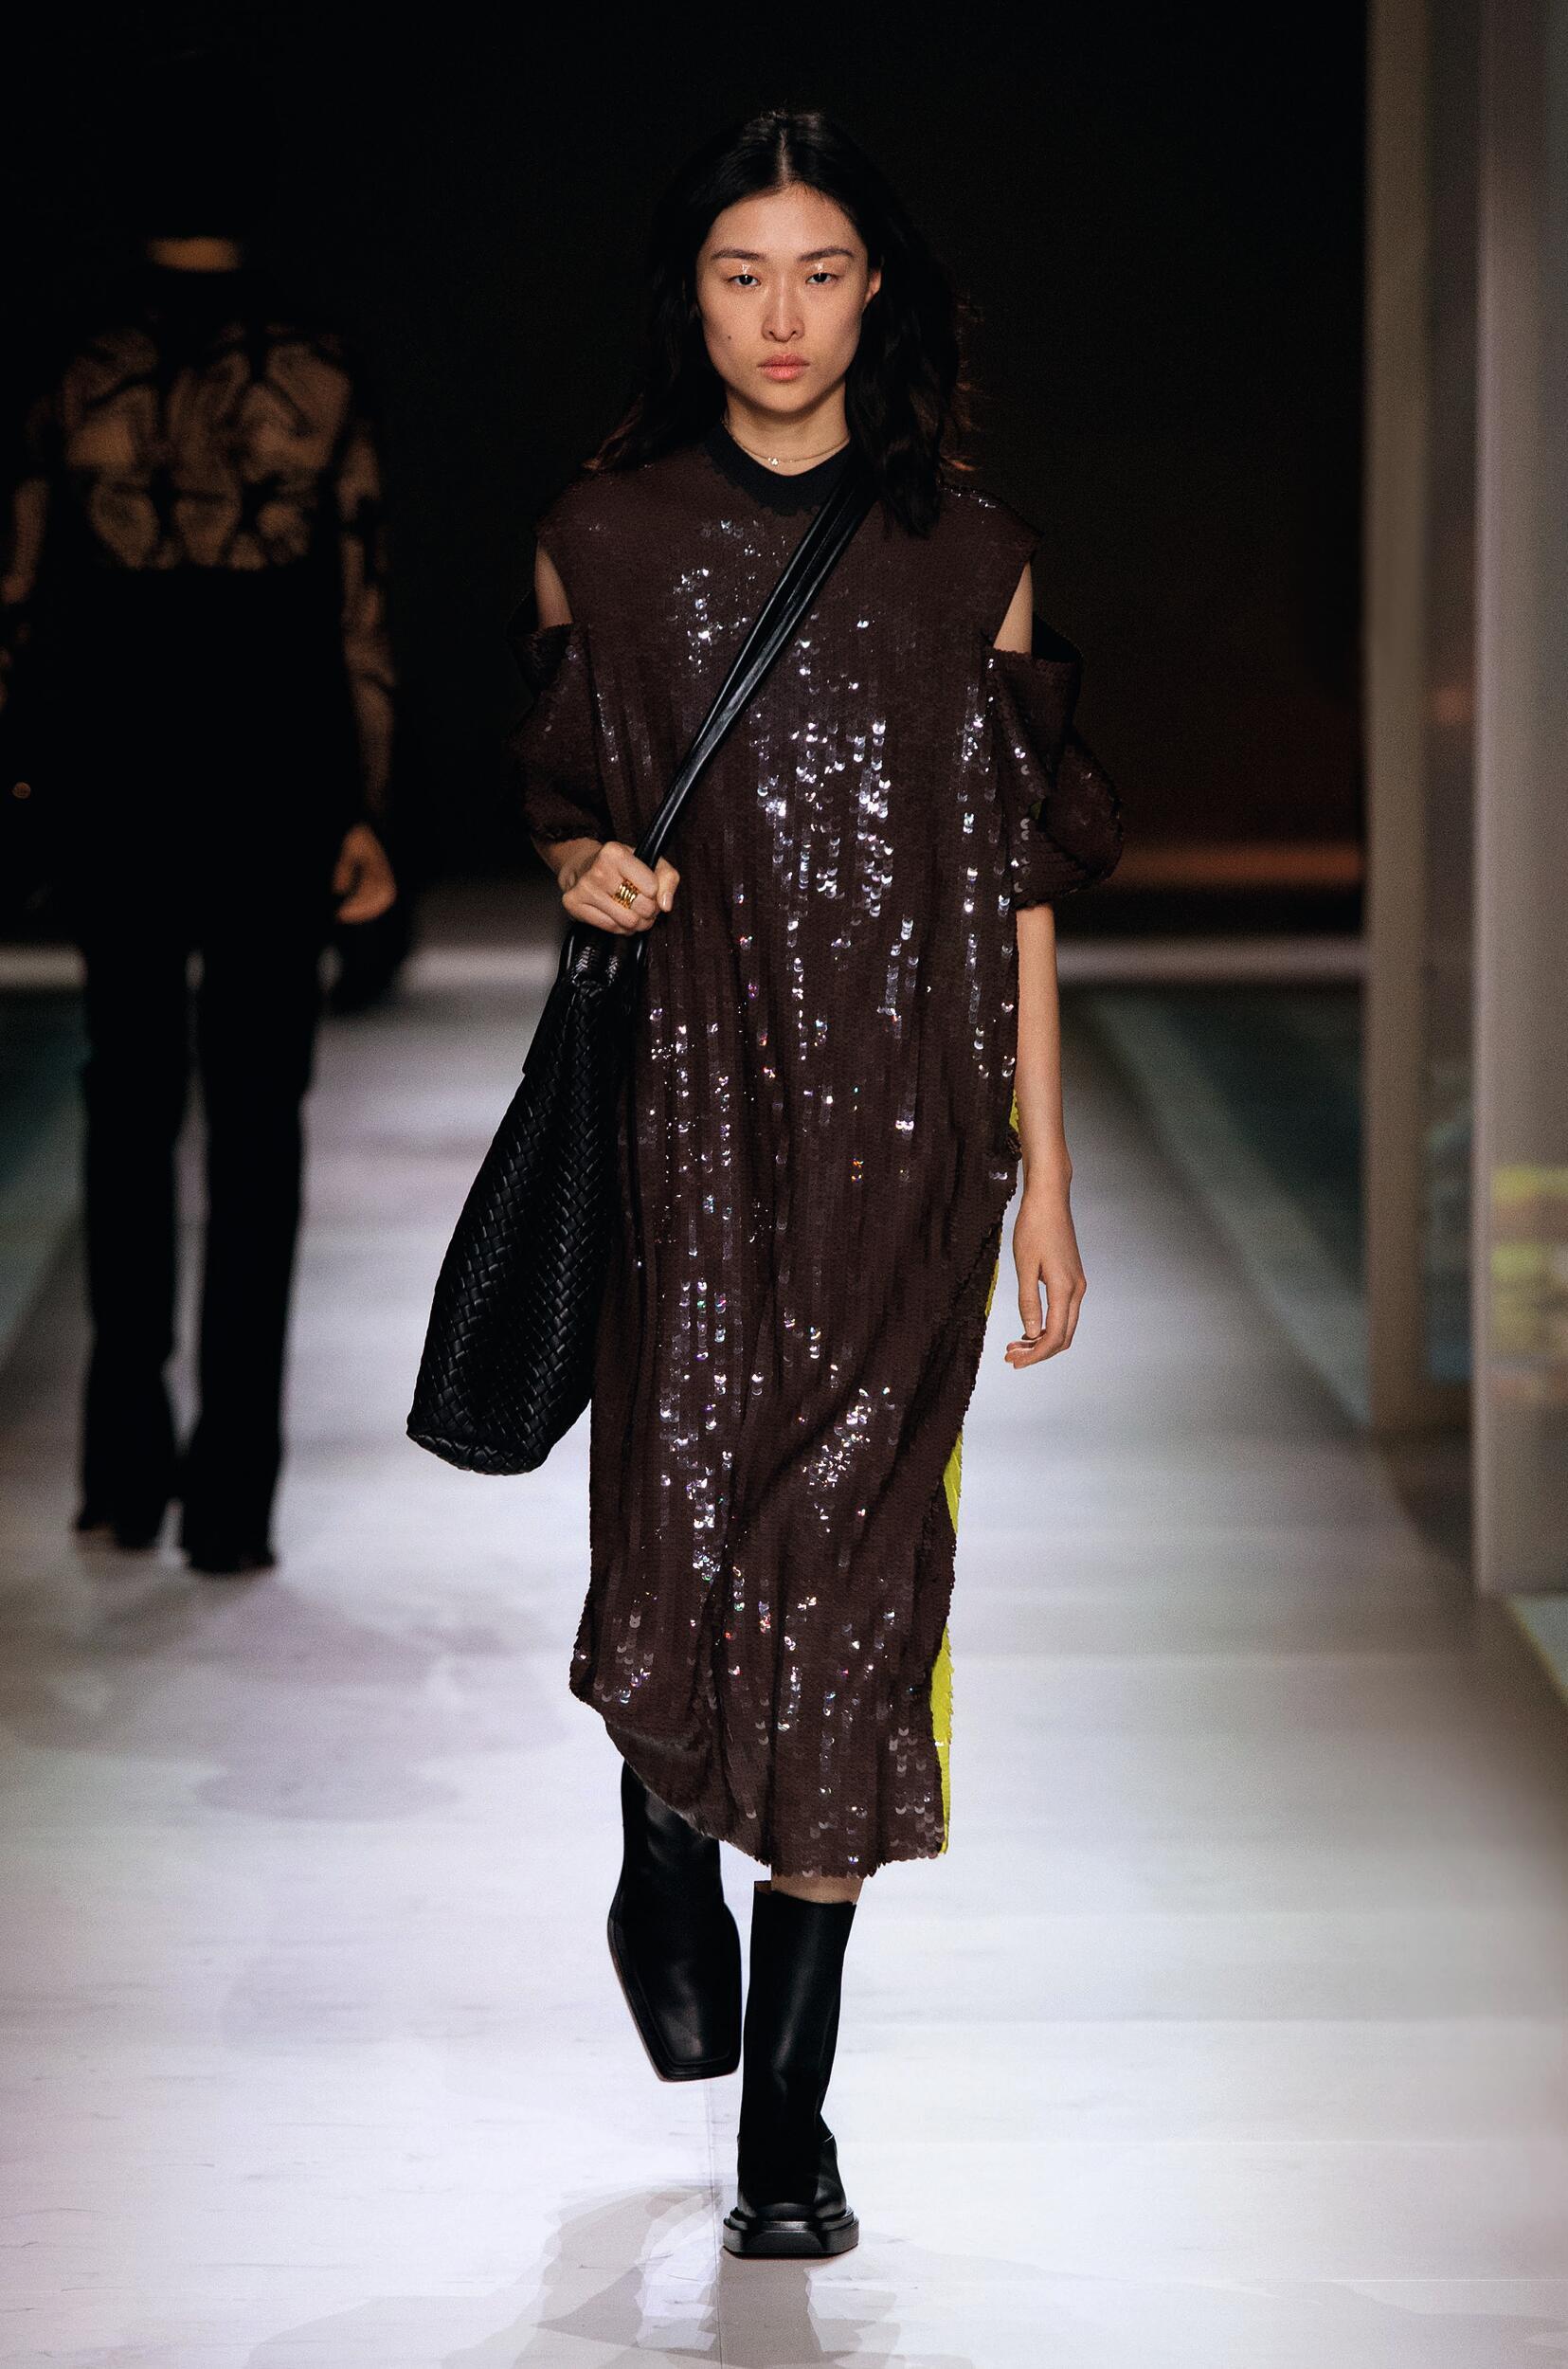 Fashion Show Woman Model Bottega Veneta Catwalk